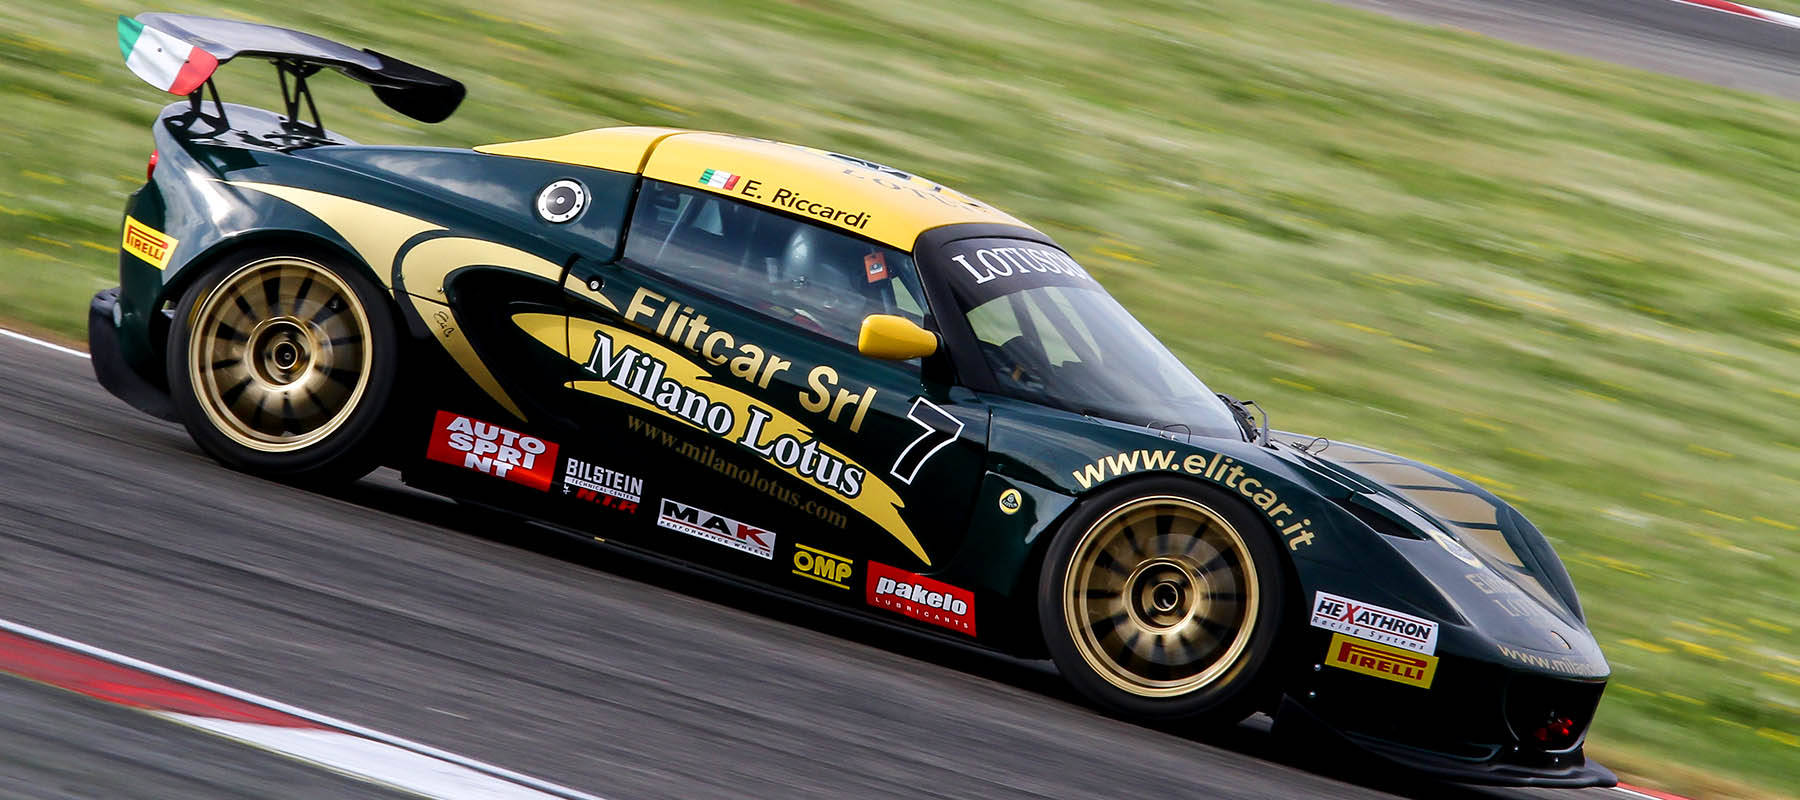 elitcar-racing-lotus-milano-vetture-aziendali-4